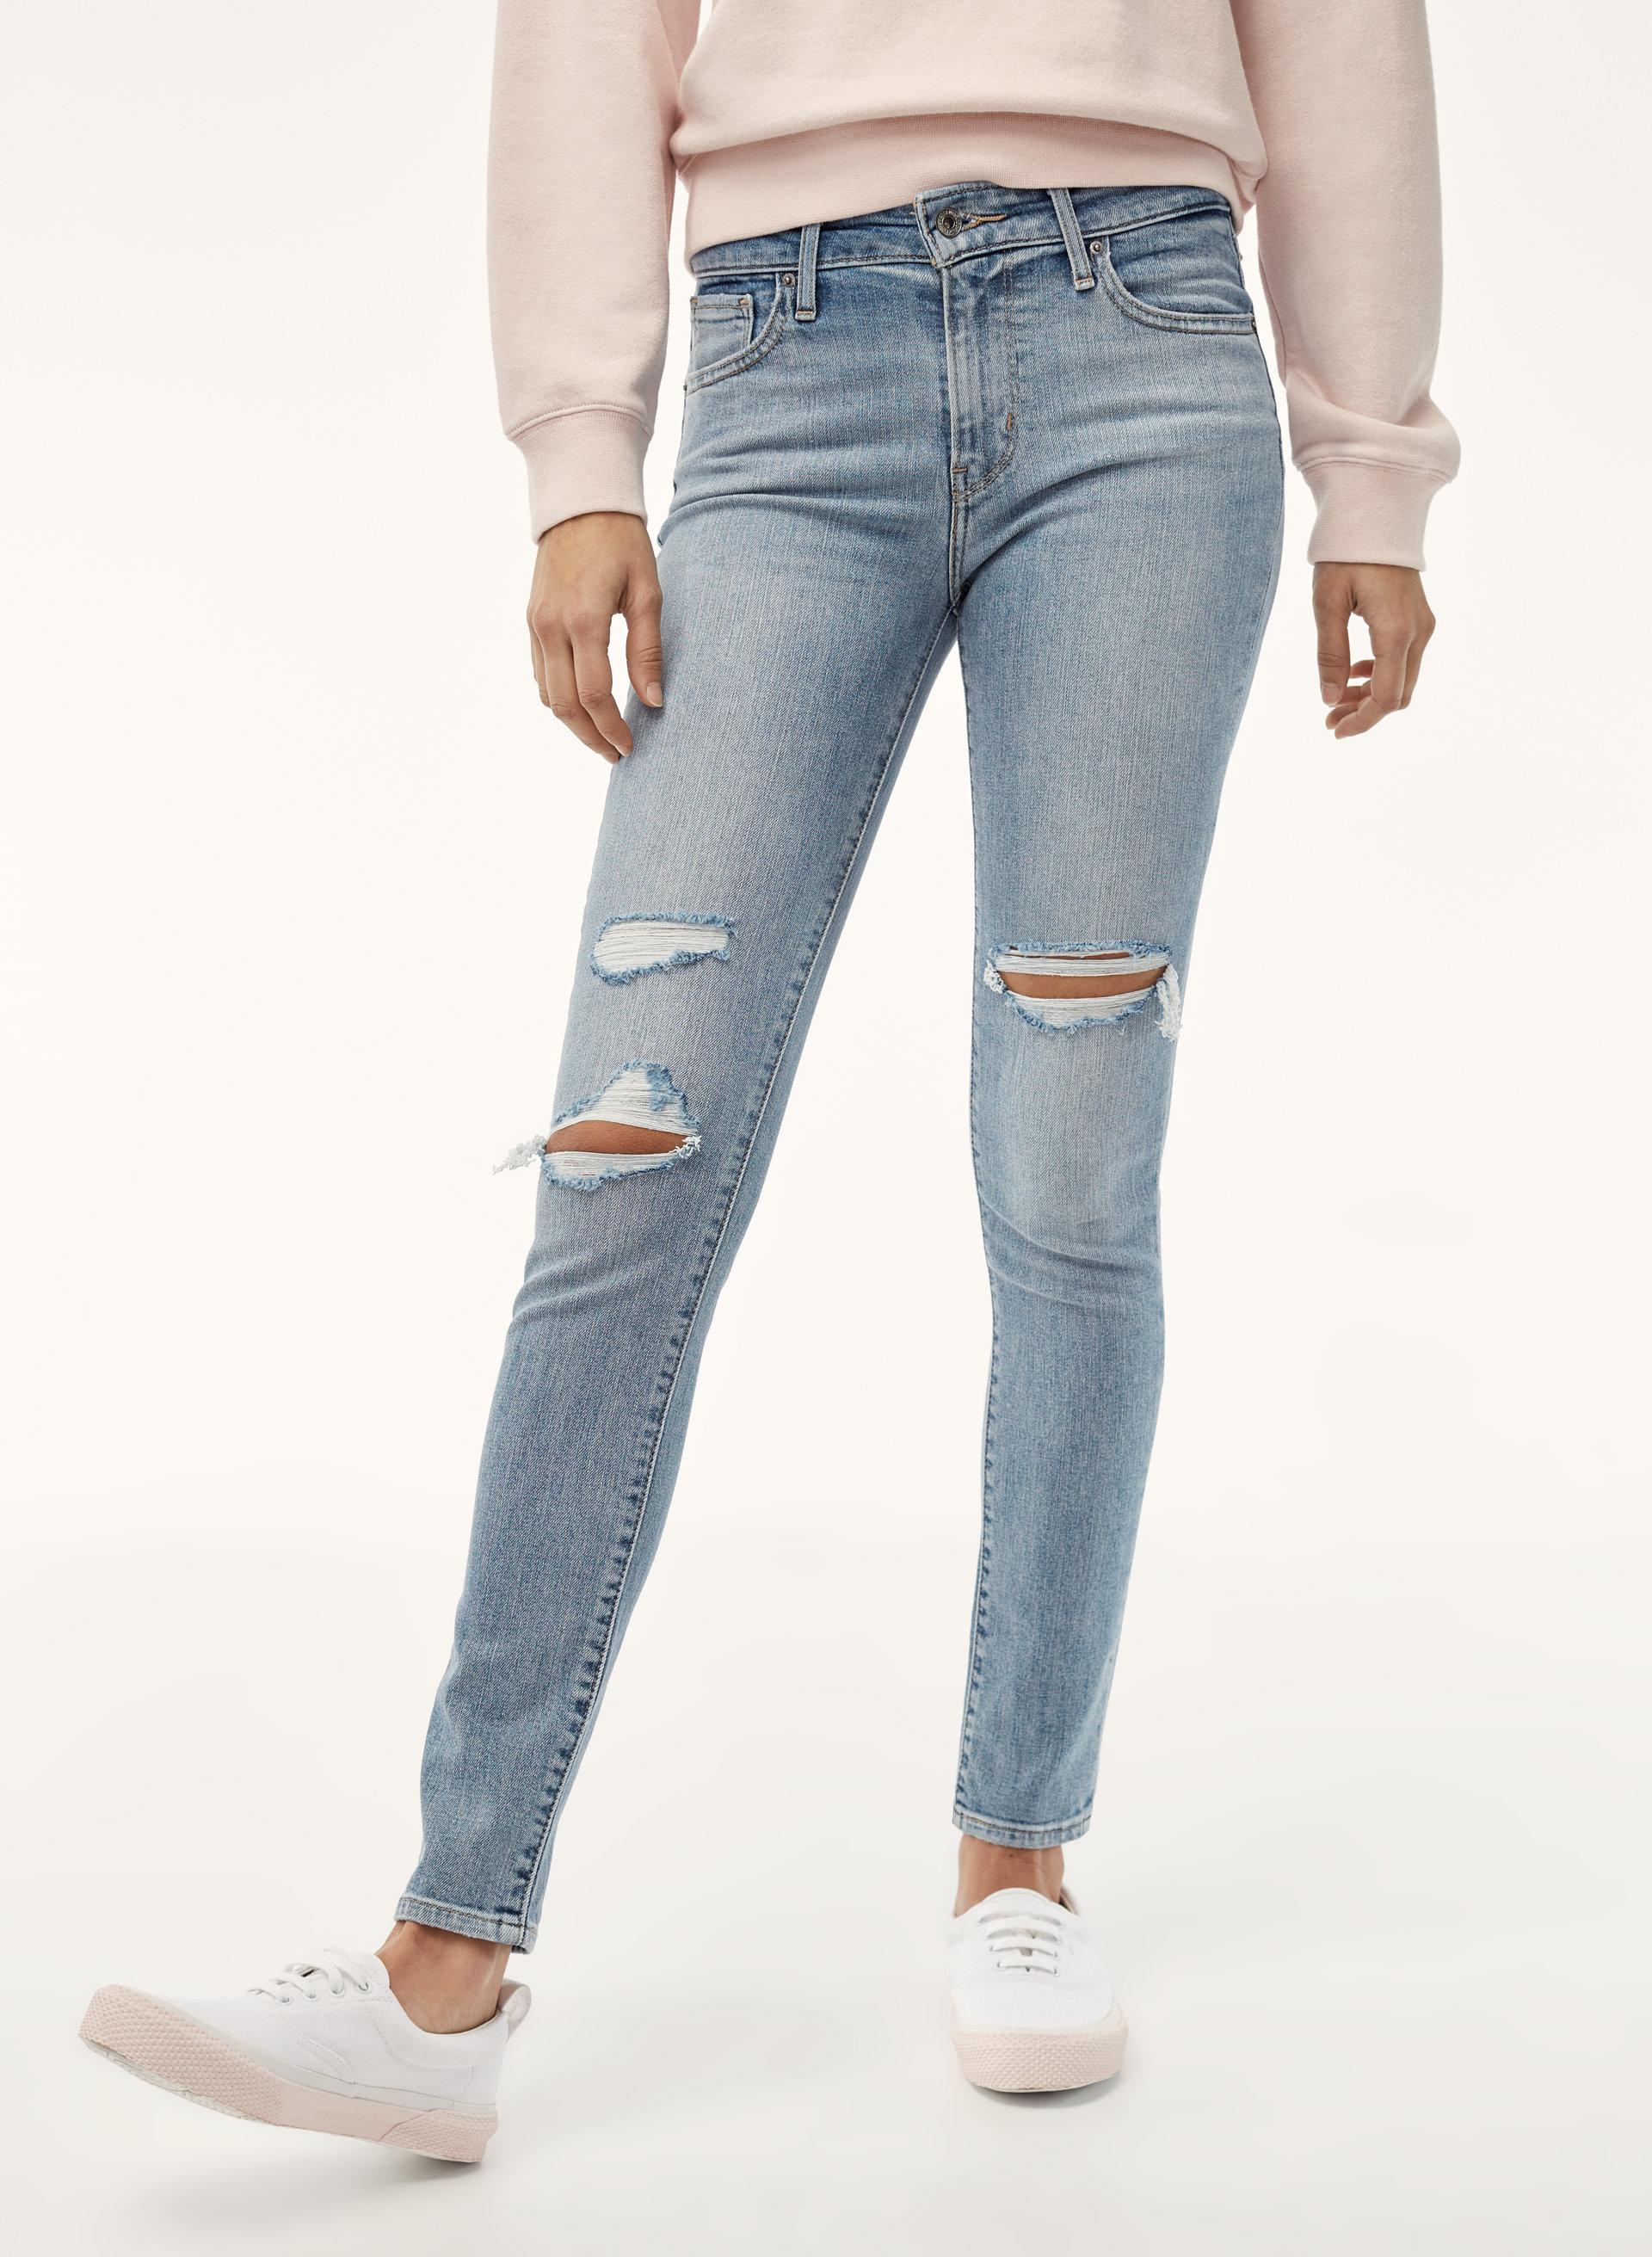 Levis 721 Skinny Aritzia Ca Vintage Skin Rip Off Stretch Soft Jeans